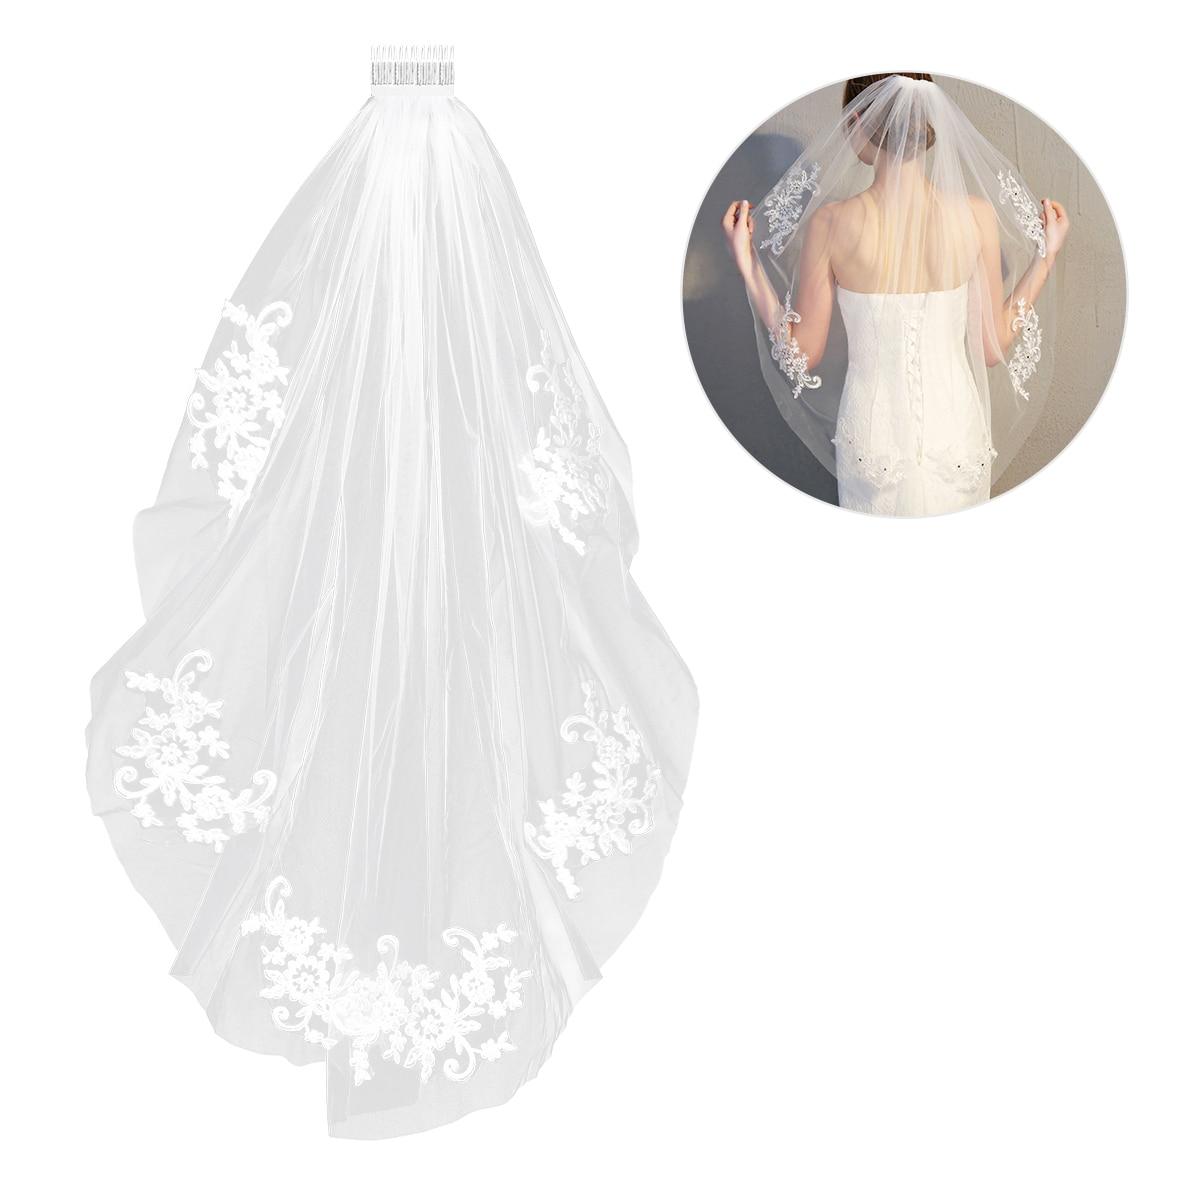 1 5m Bridal Veil Short Wedding Veil Transparent Mesh Bride Veil For Wedding Hairstyle Accessories Leather Bag